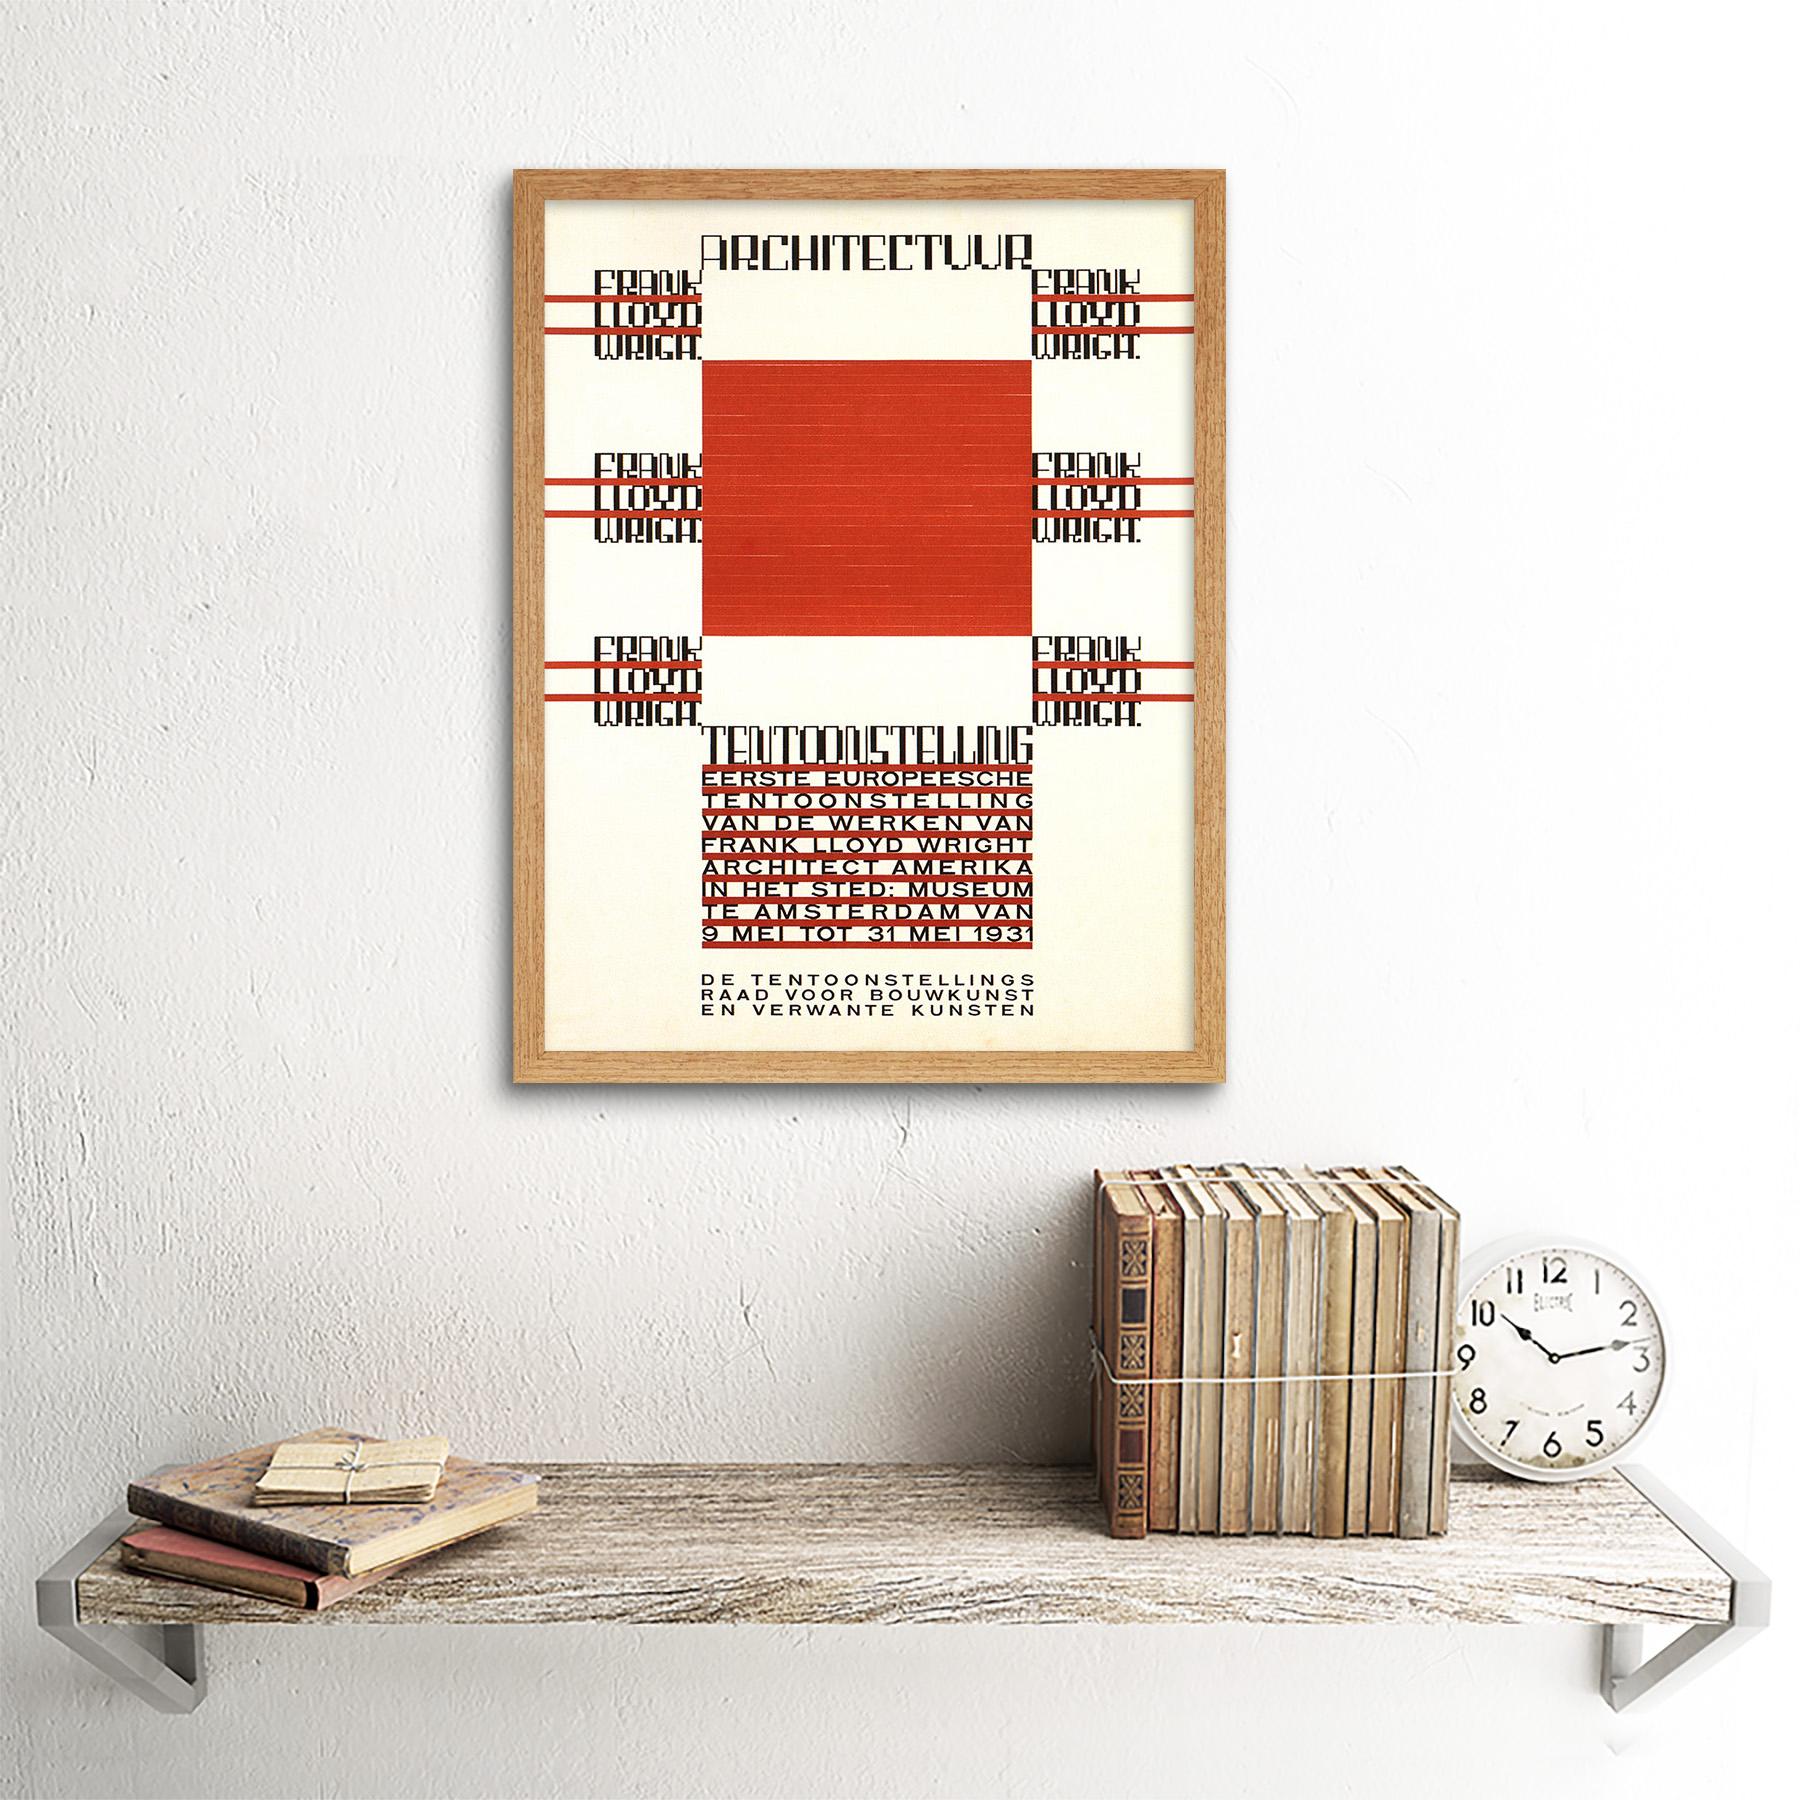 Exhibition Architecture Frank Lloyd Wright Amsterdam Netherlands Framed Print